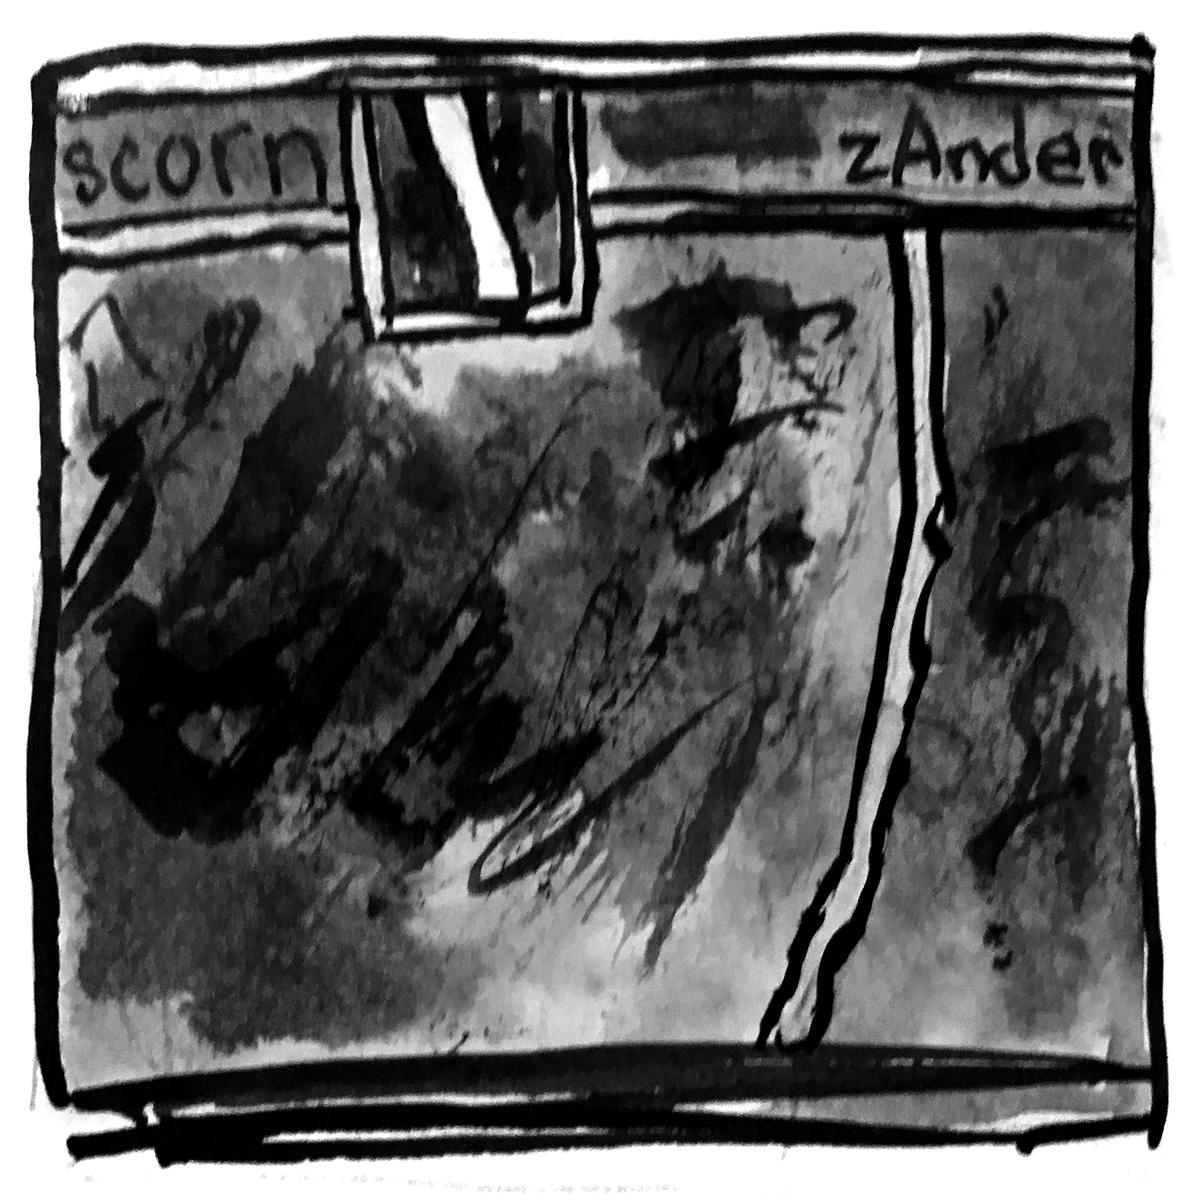 Scorn Zander